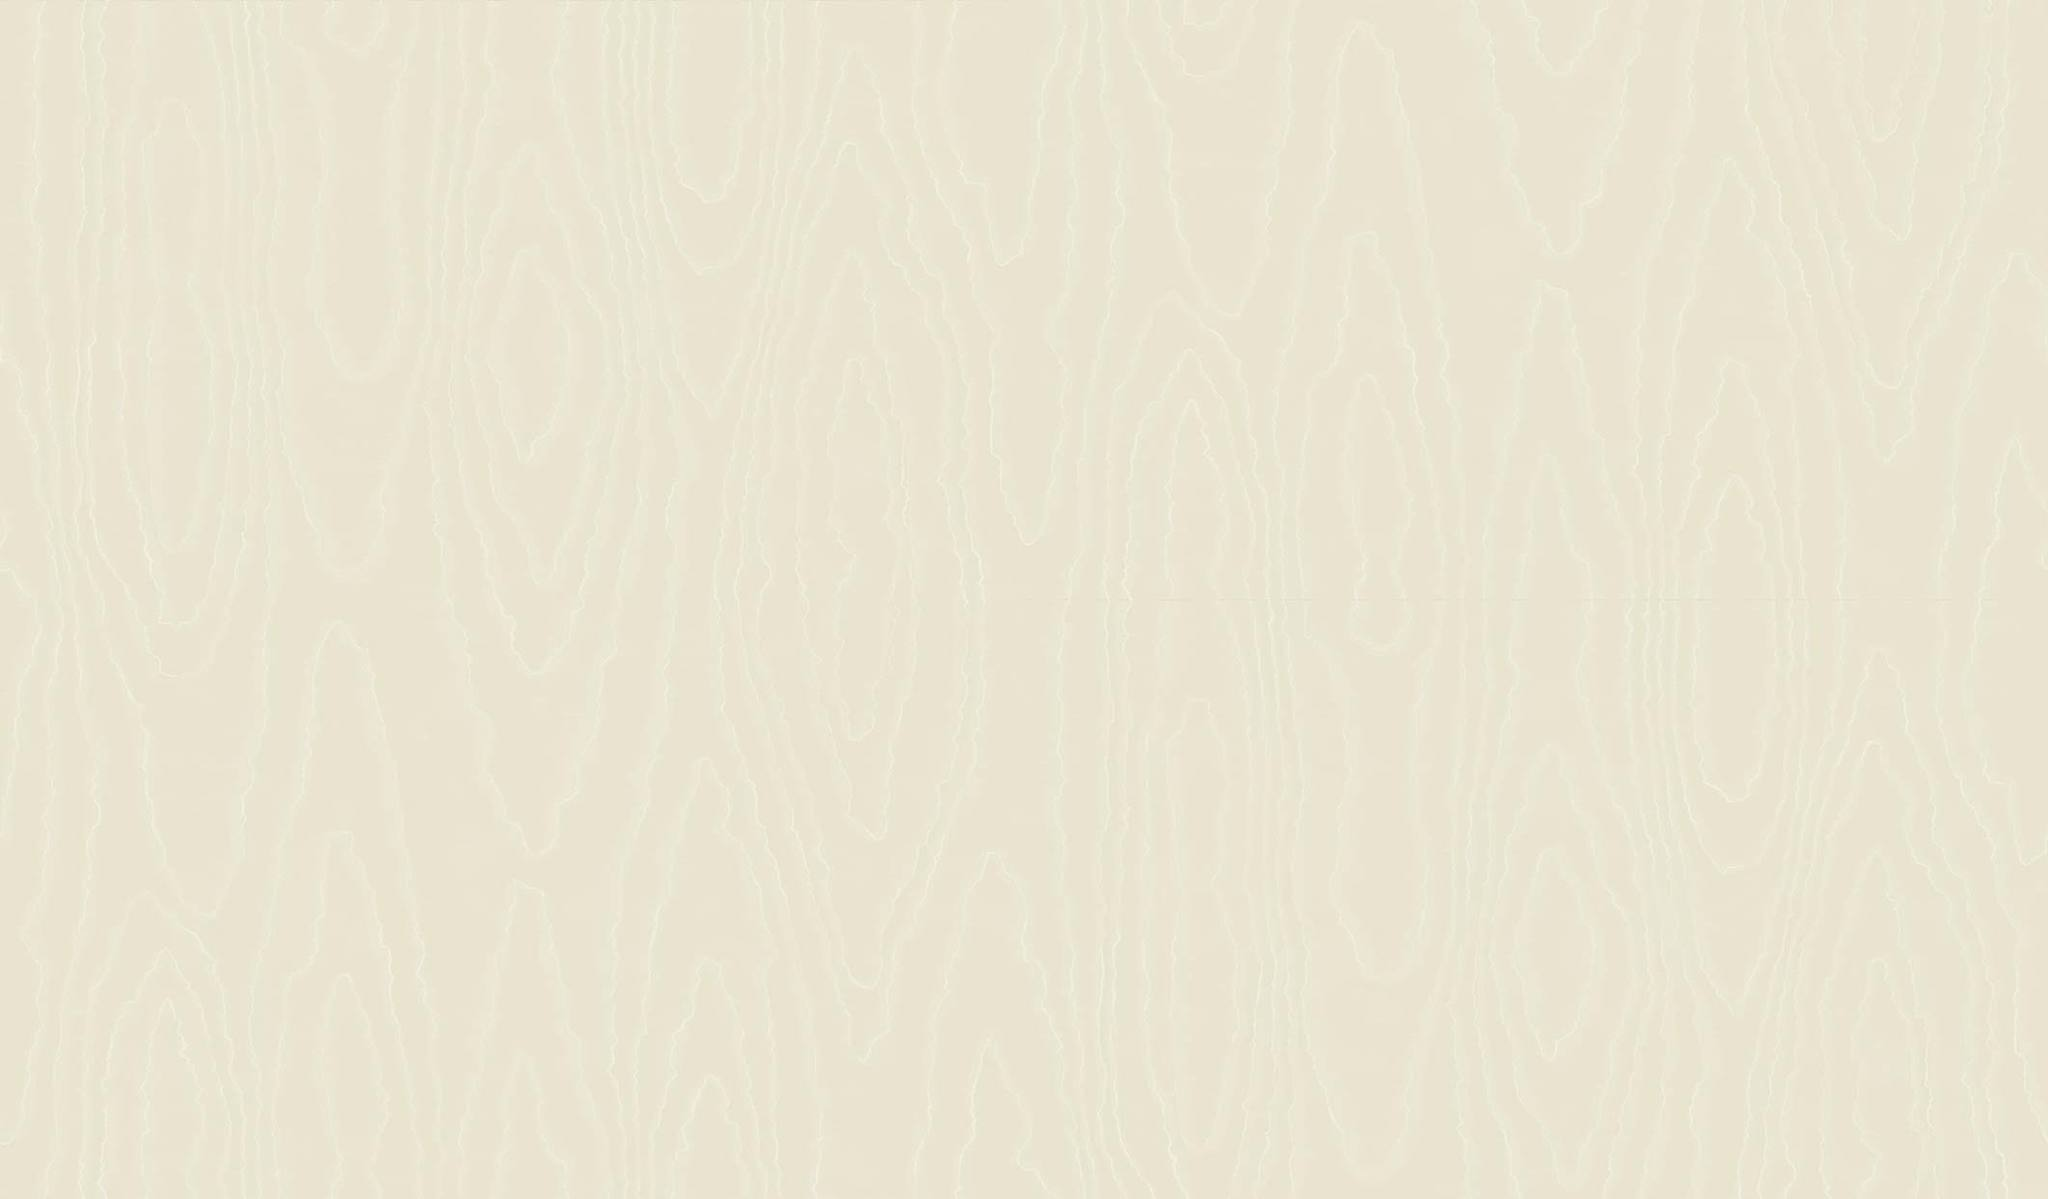 Обои Cole & Son Landscape Plains 106/1010, интернет магазин Волео